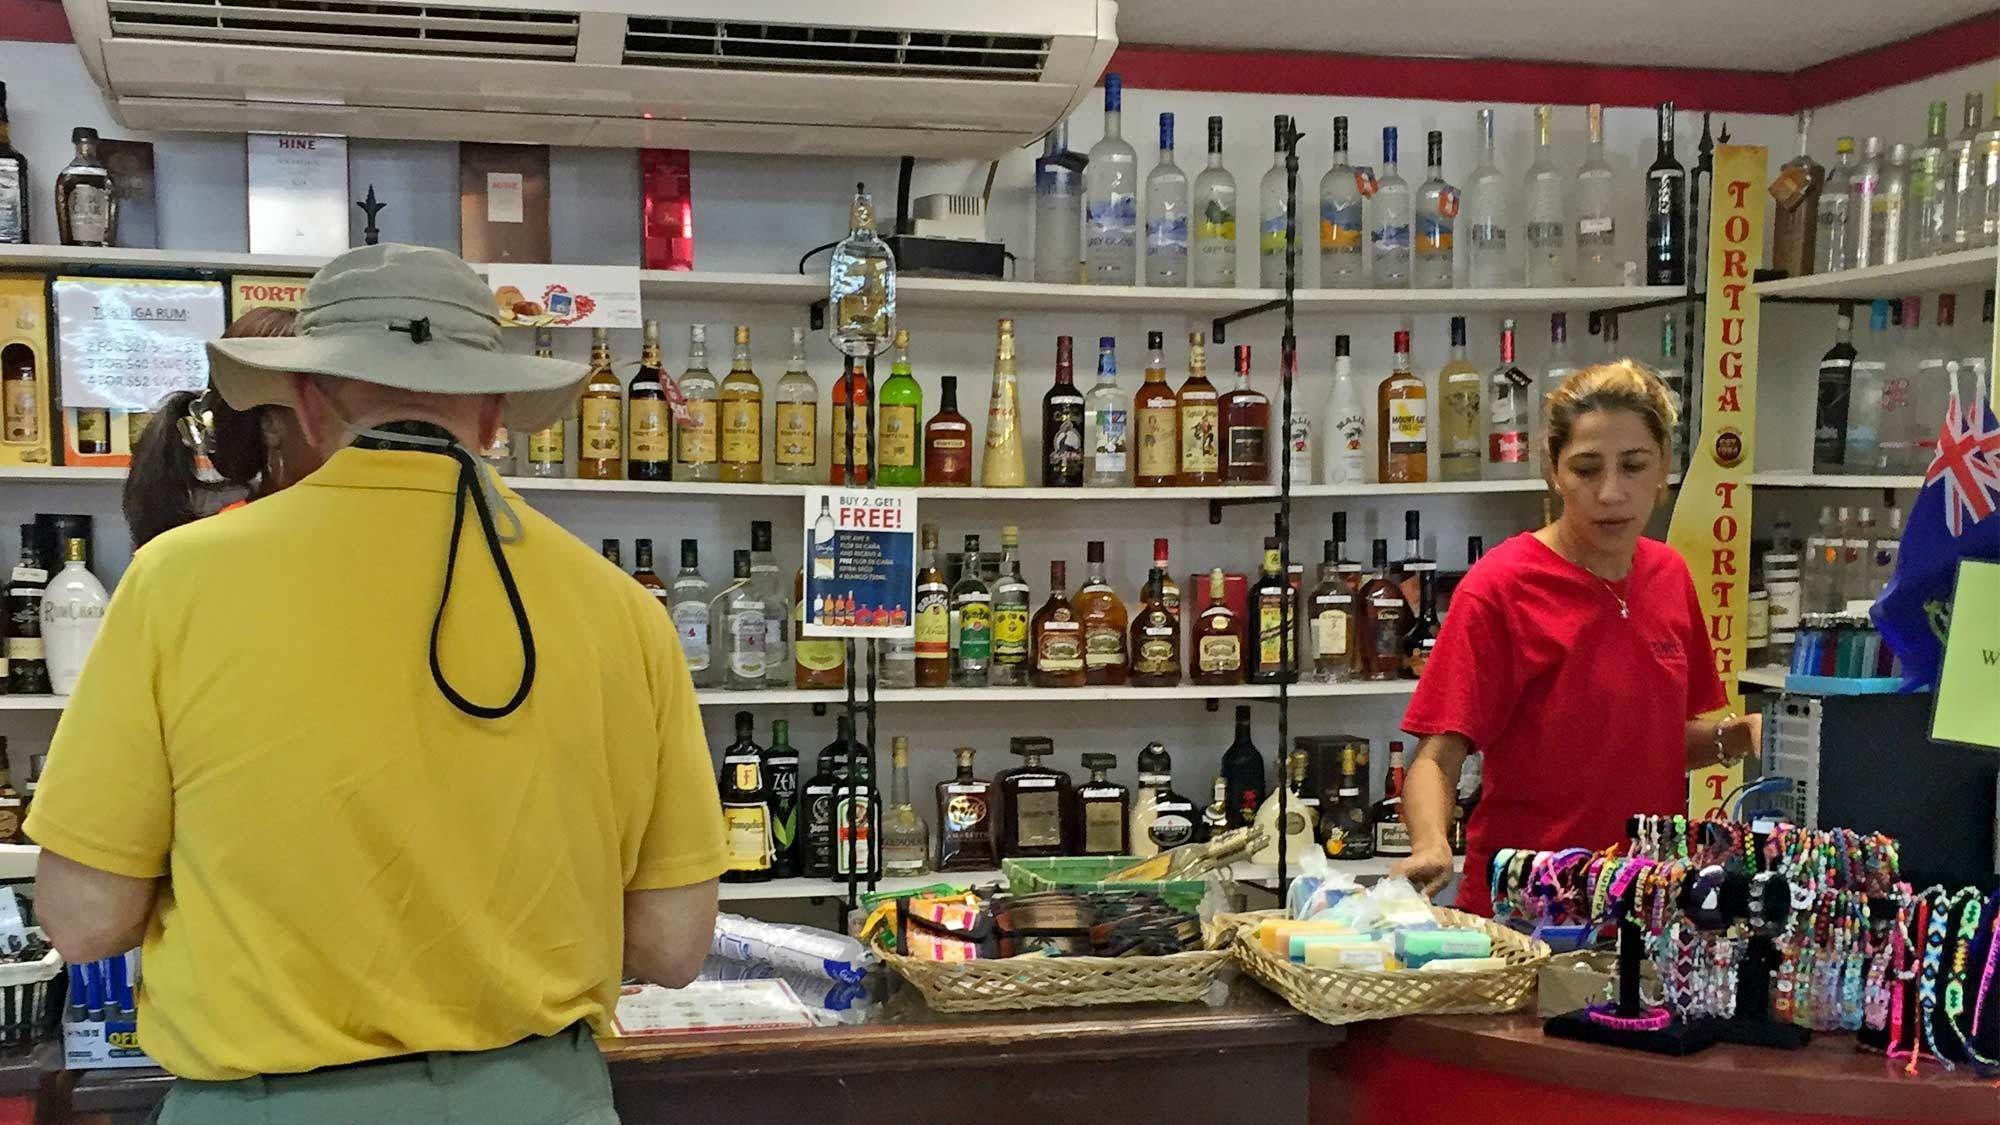 Inside a souvinir shop in the Cayman Islands